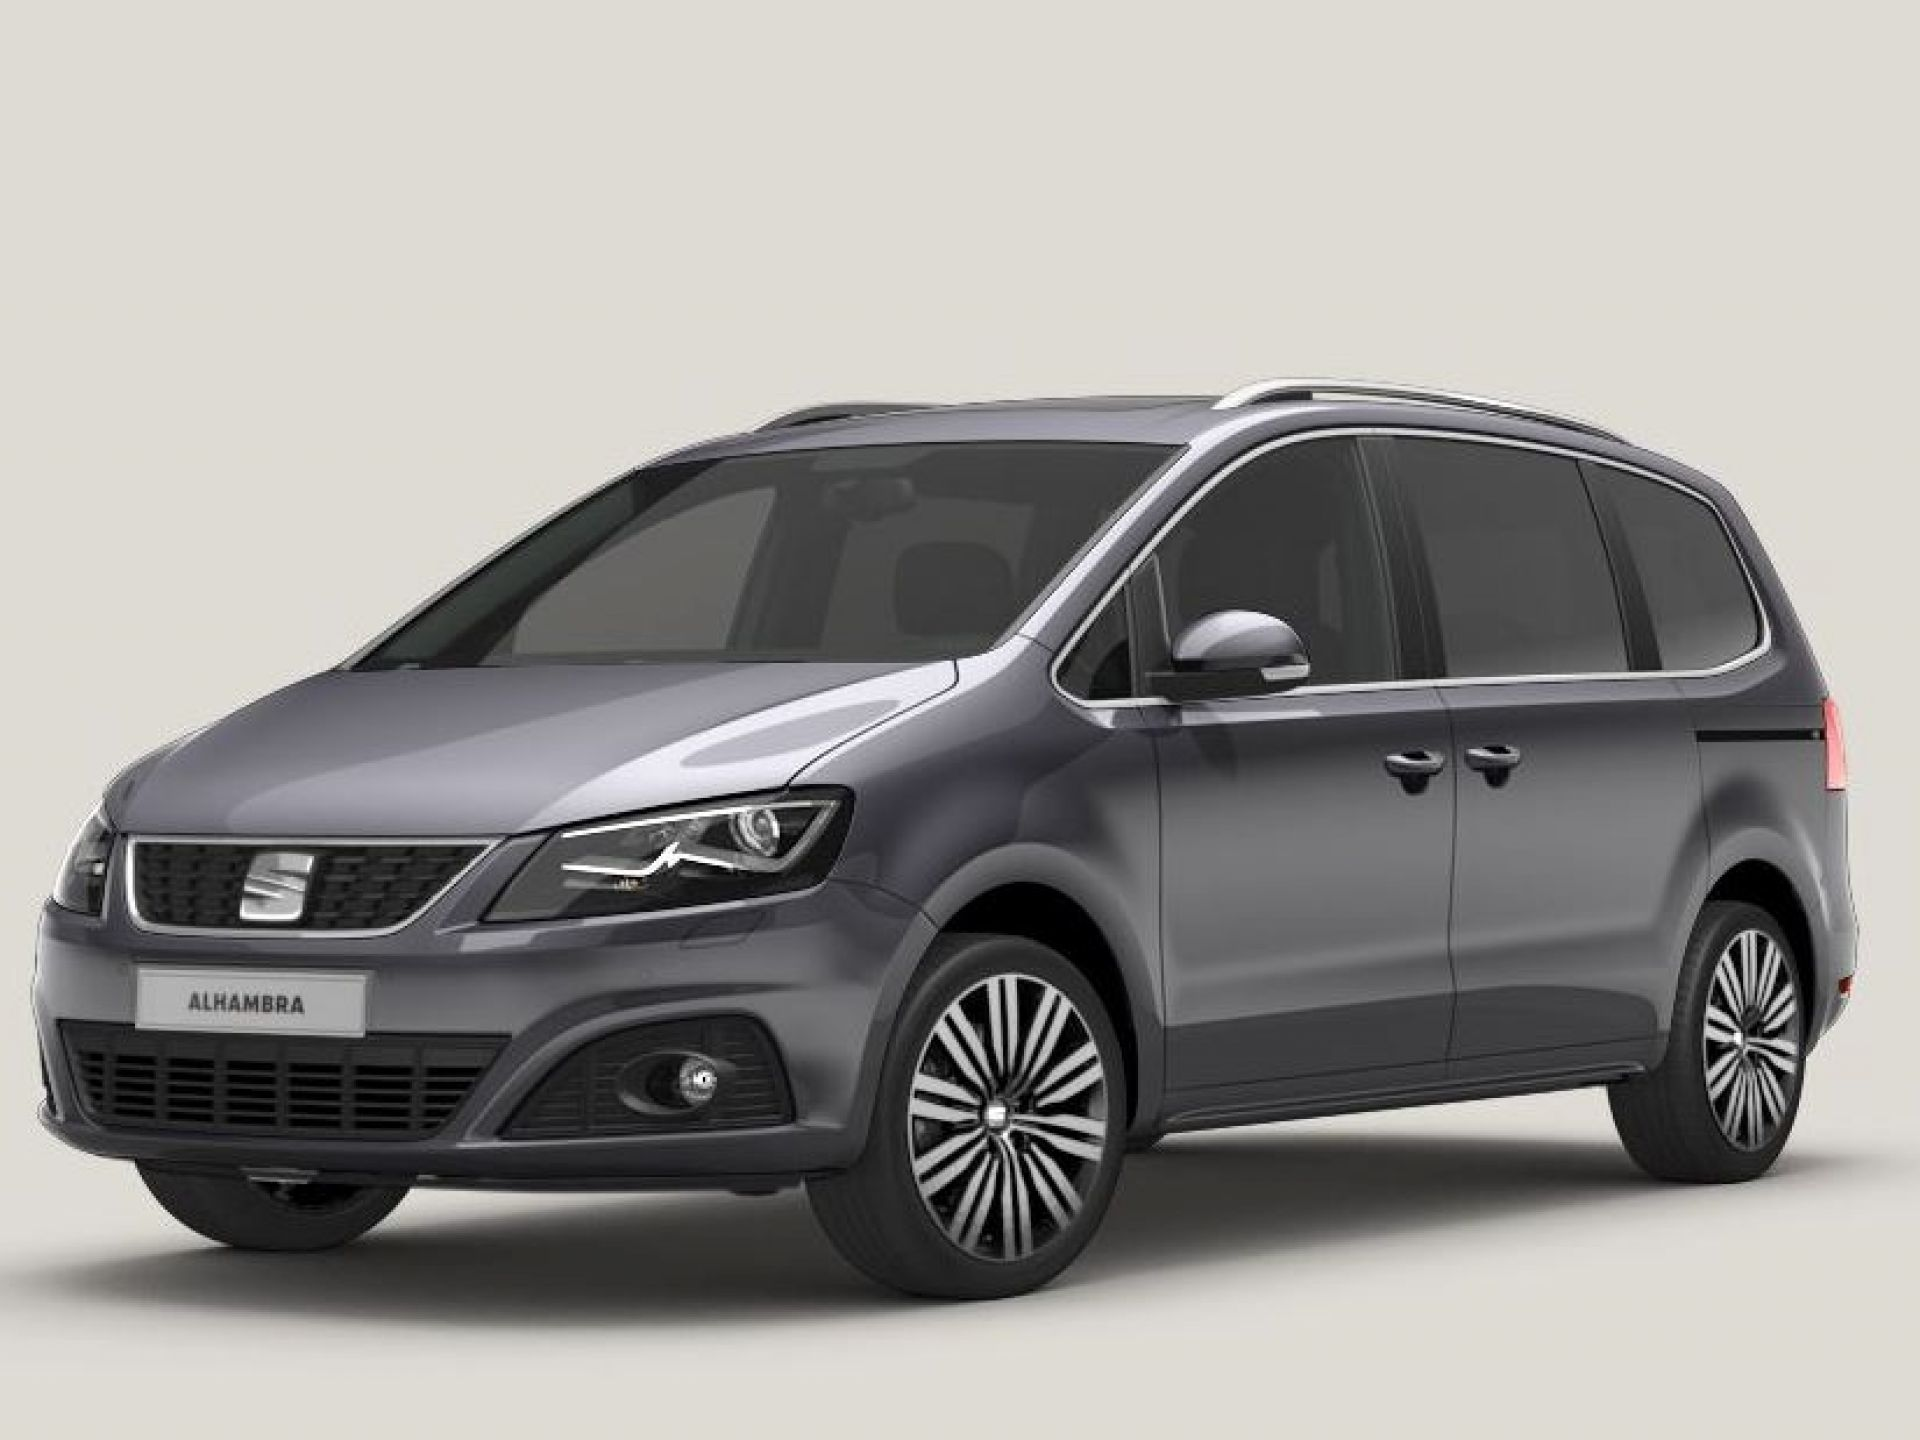 SEAT Alhambra 2.0 TDI 110kW DSG St&Sp Xcellence GO nuevo Madrid